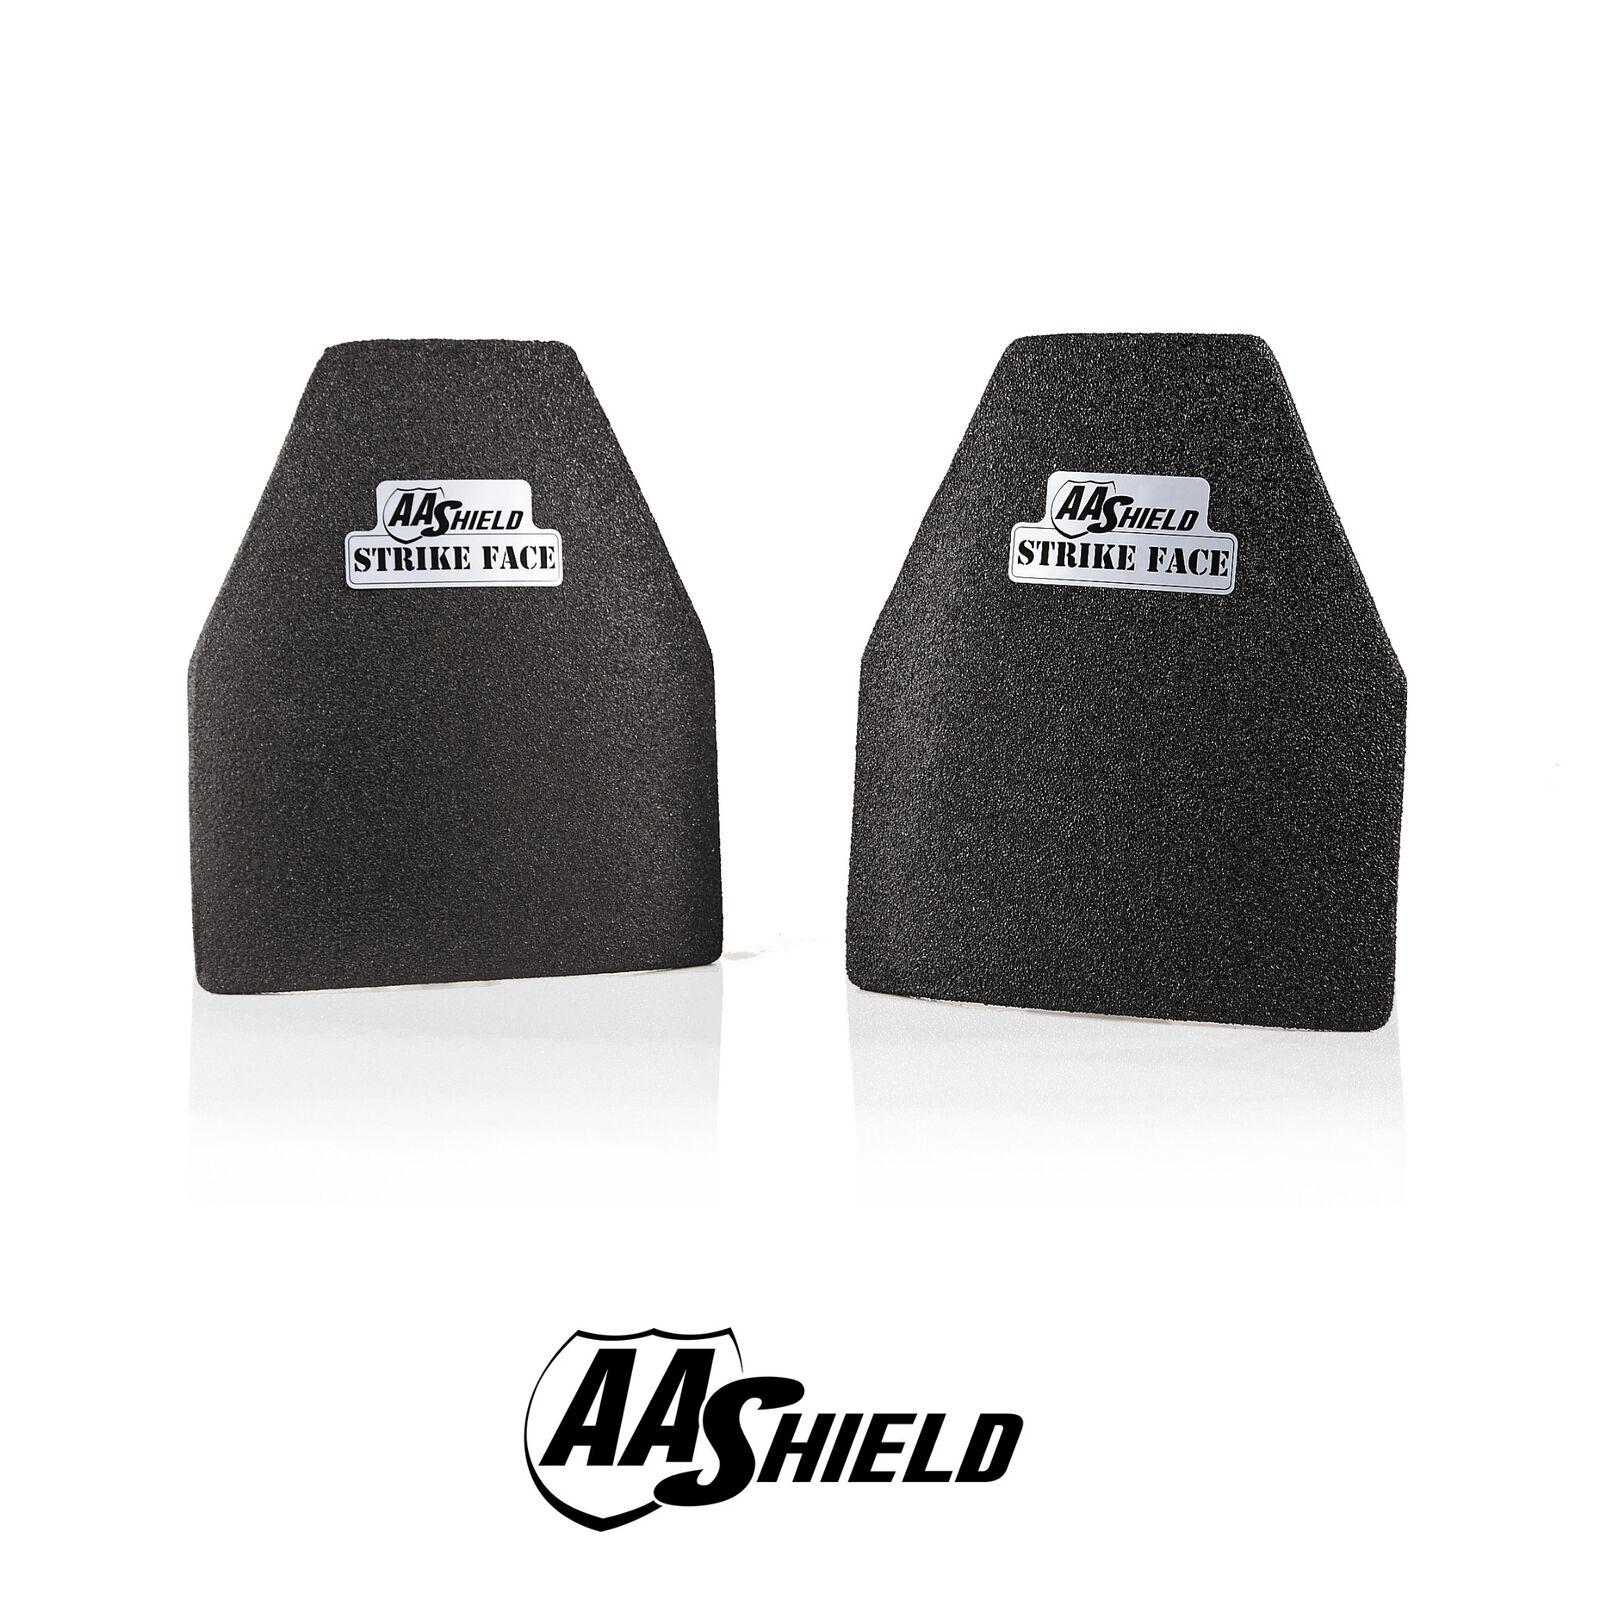 AA Shield Bulletproof Body Armor Hard Plate Lvl IIIA 3A 10x12Swimmer Cut Pair